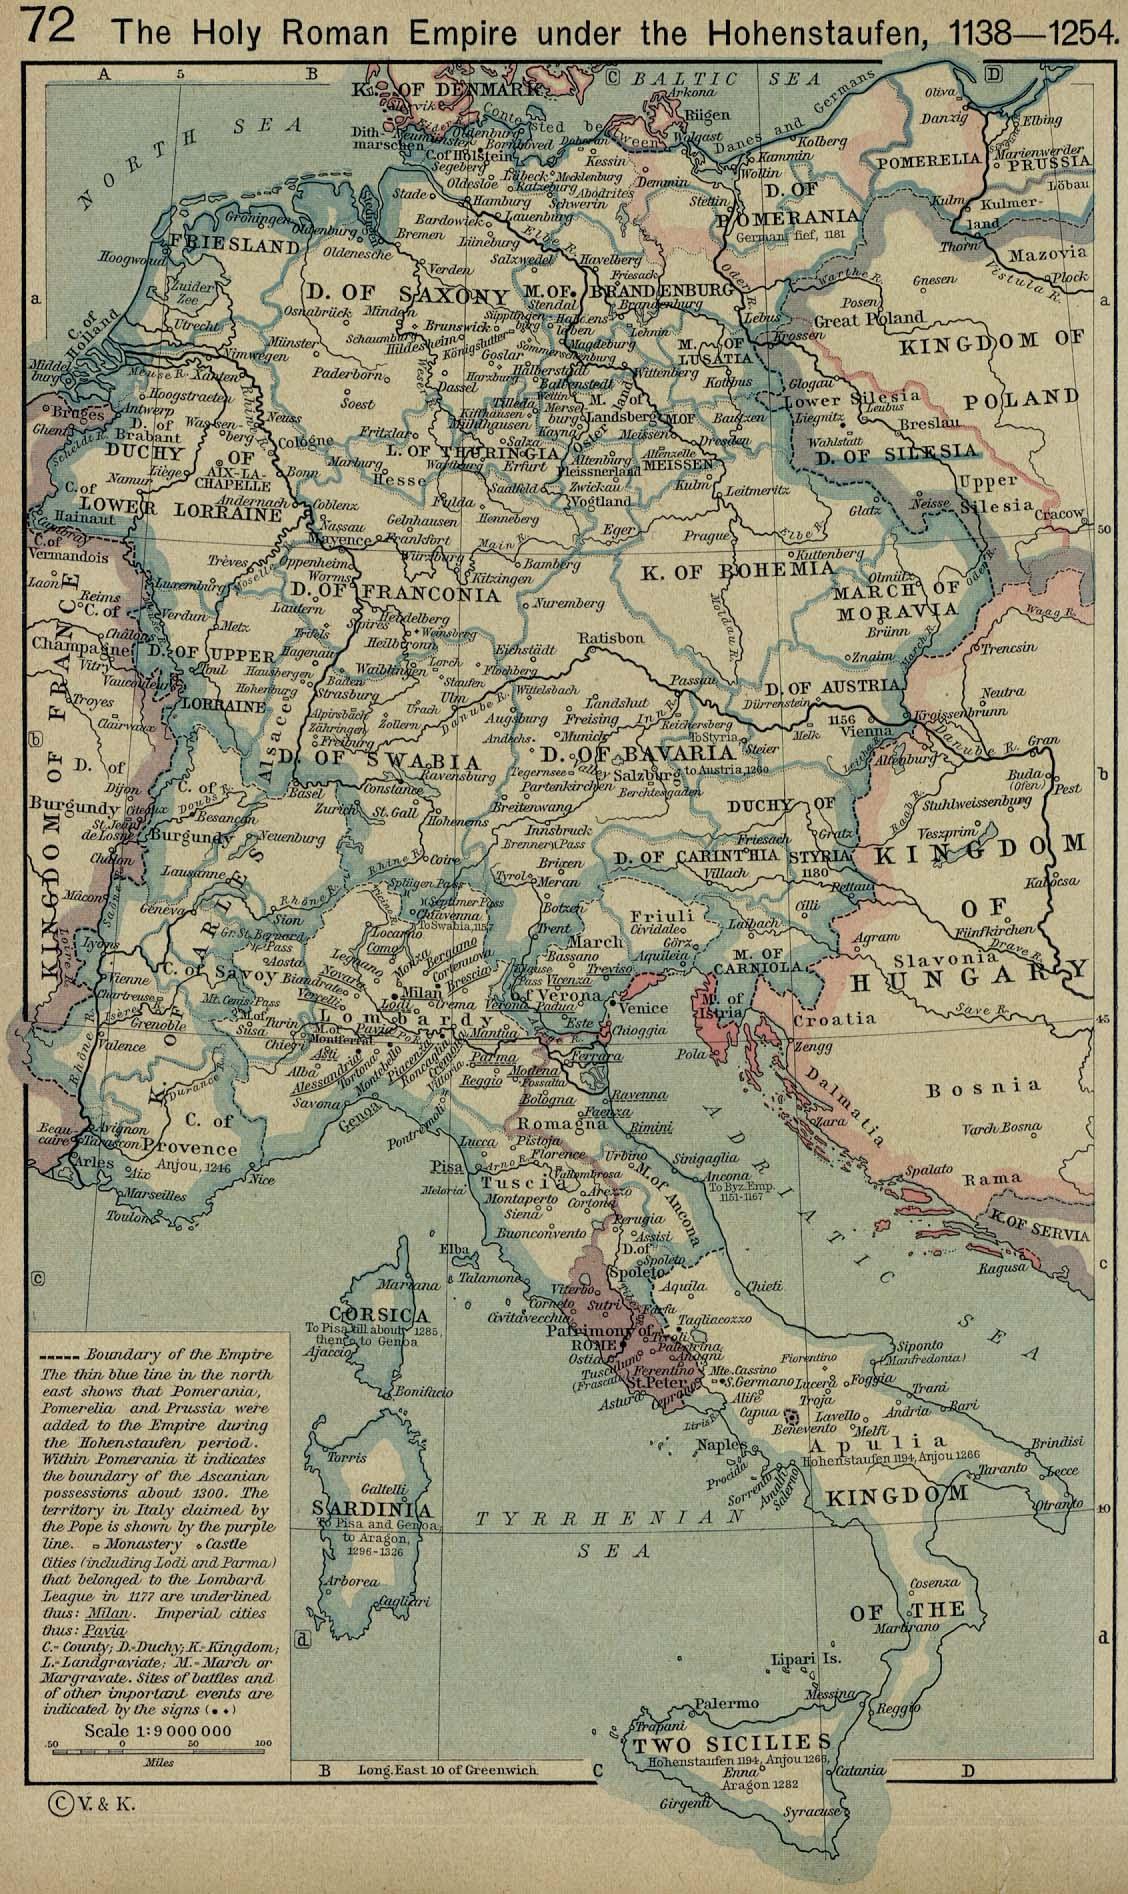 The Holy Roman Empire 1138-1254